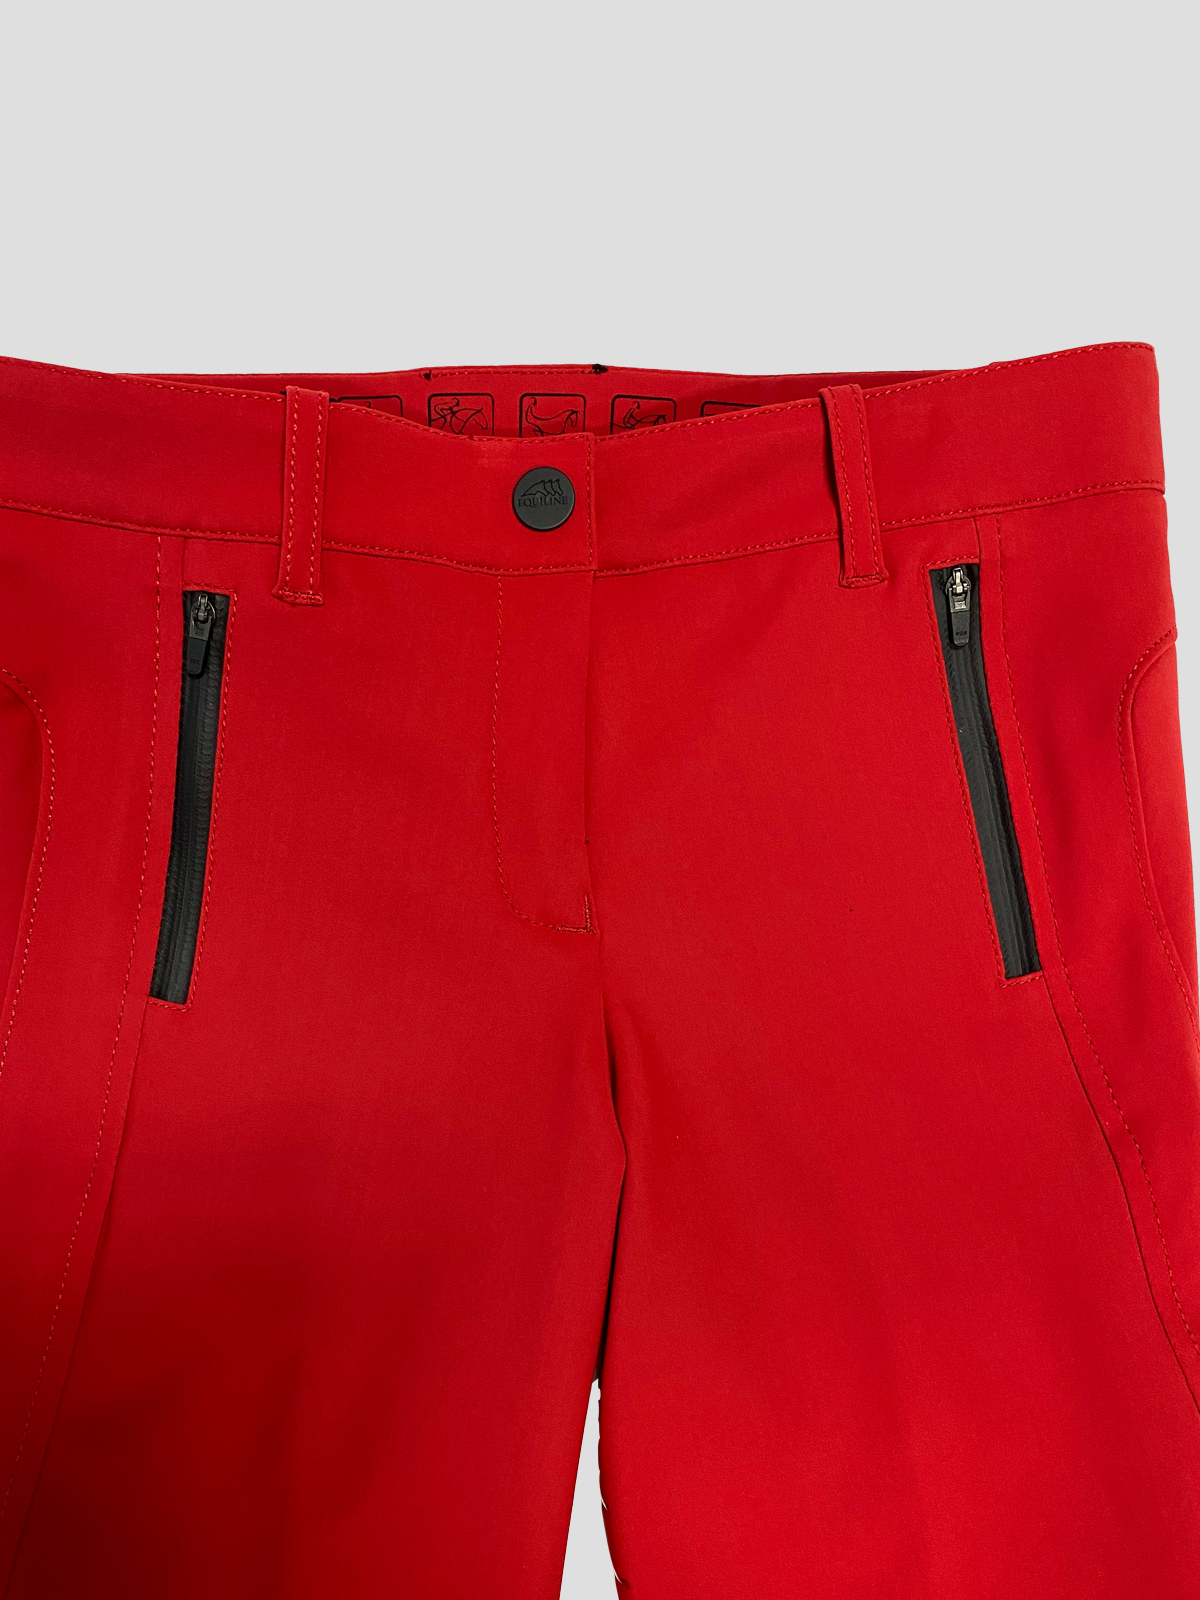 CHILLAN WOMEN'S FULL SEAT GRIP BREECHES IN RED 4